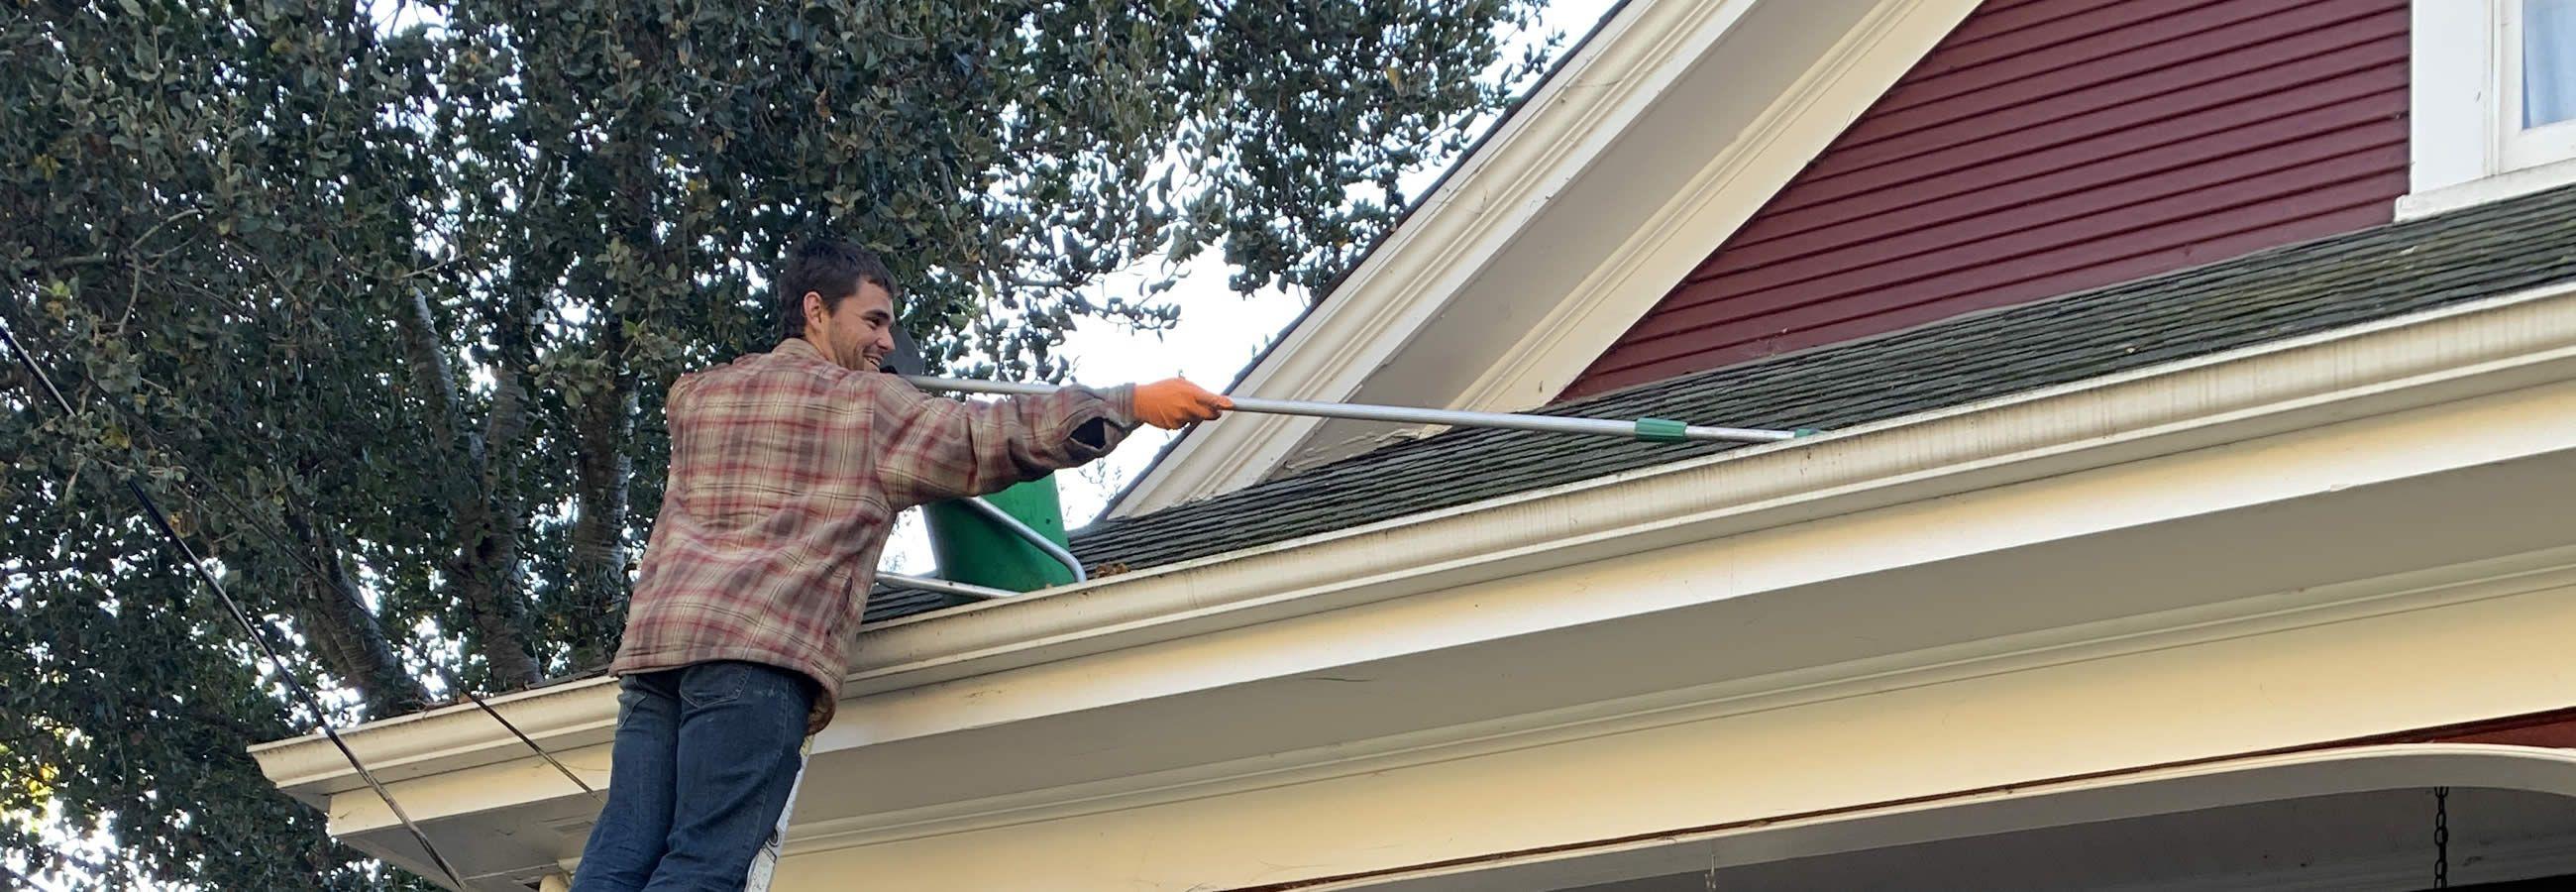 Roof Gutter Downspout Cleaning Repair In Santa Cruz Ca